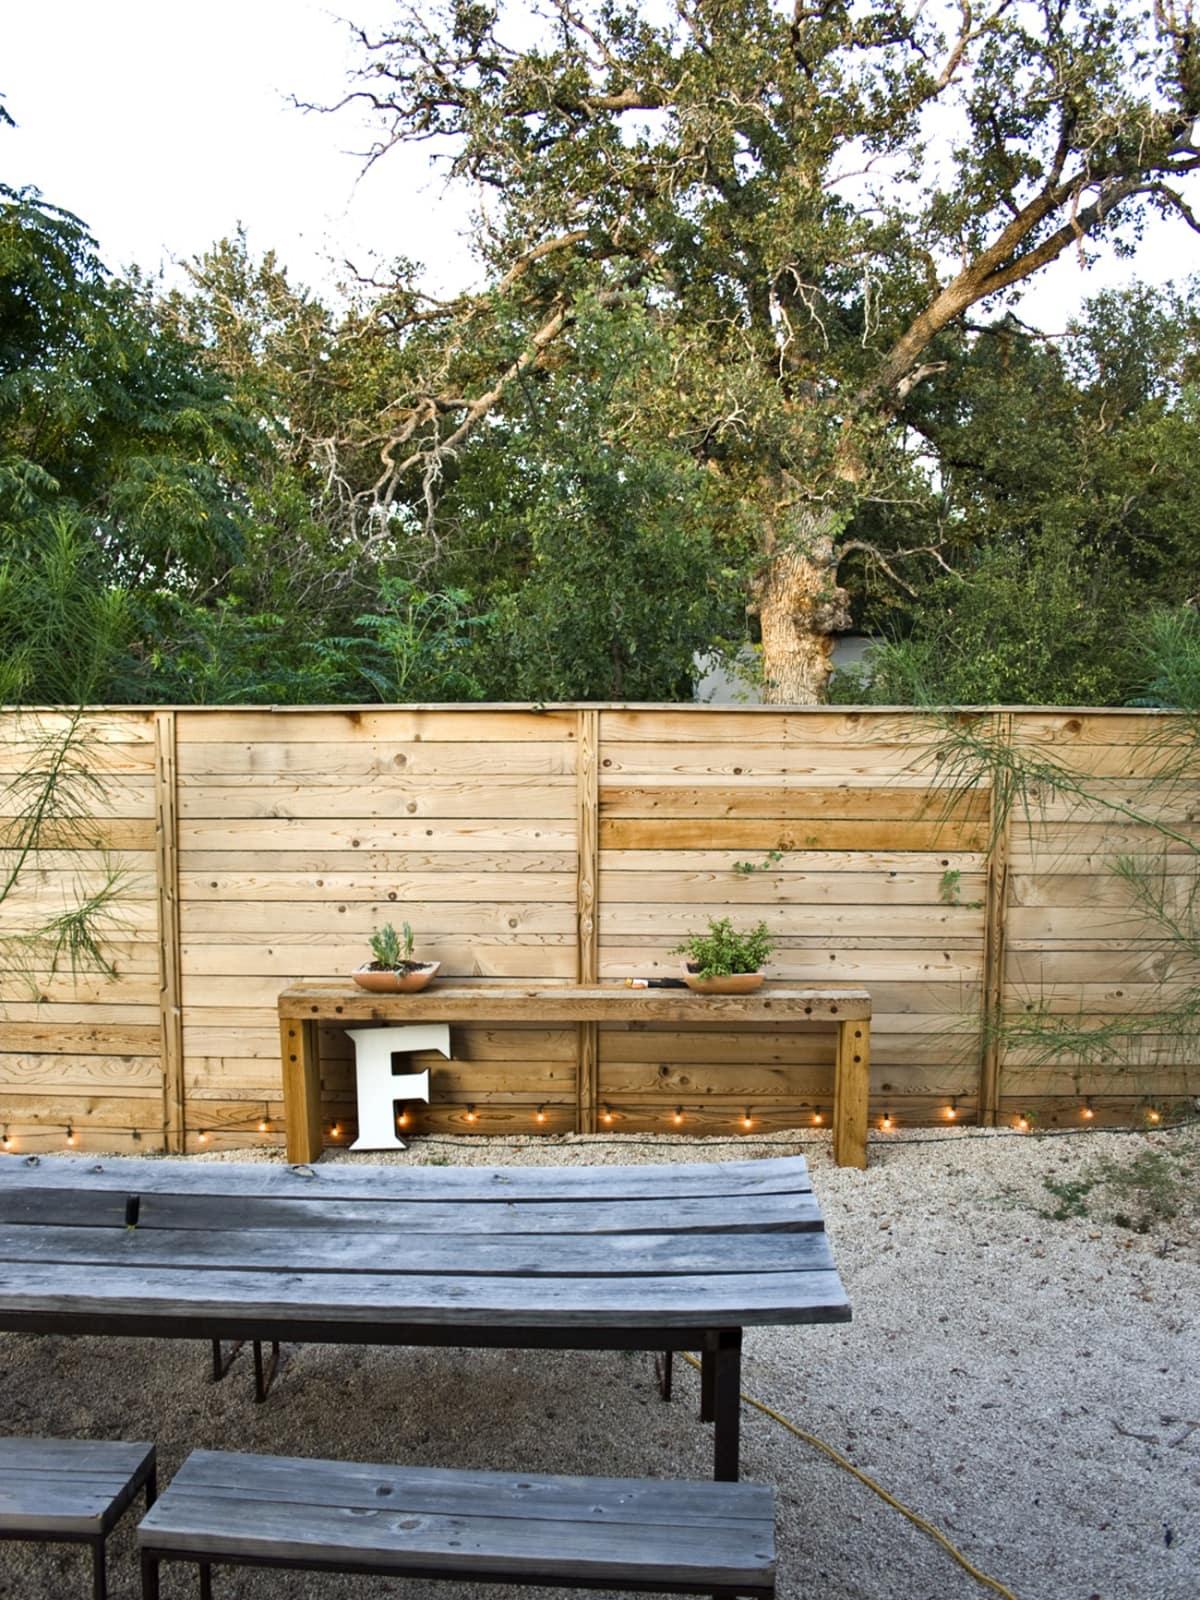 Austin backyard Moontower Design Build Image 1